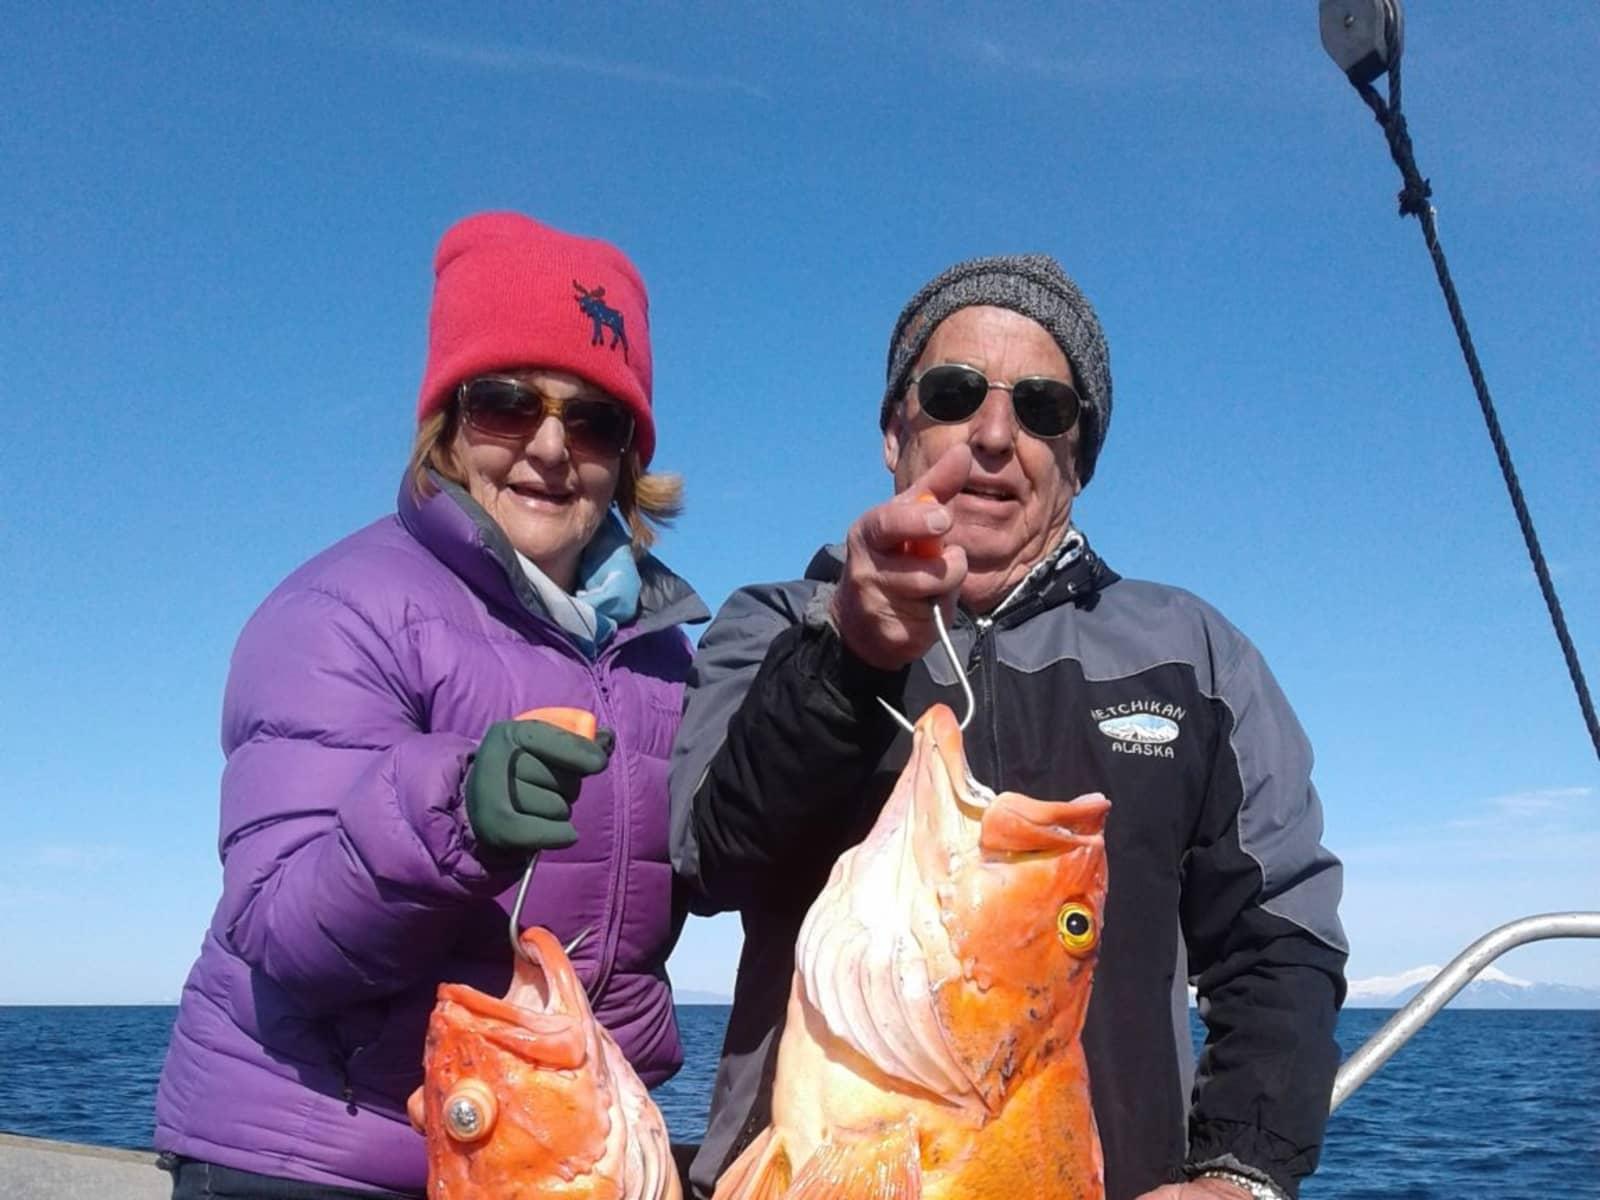 Jean & garry & Jean from Christchurch, New Zealand